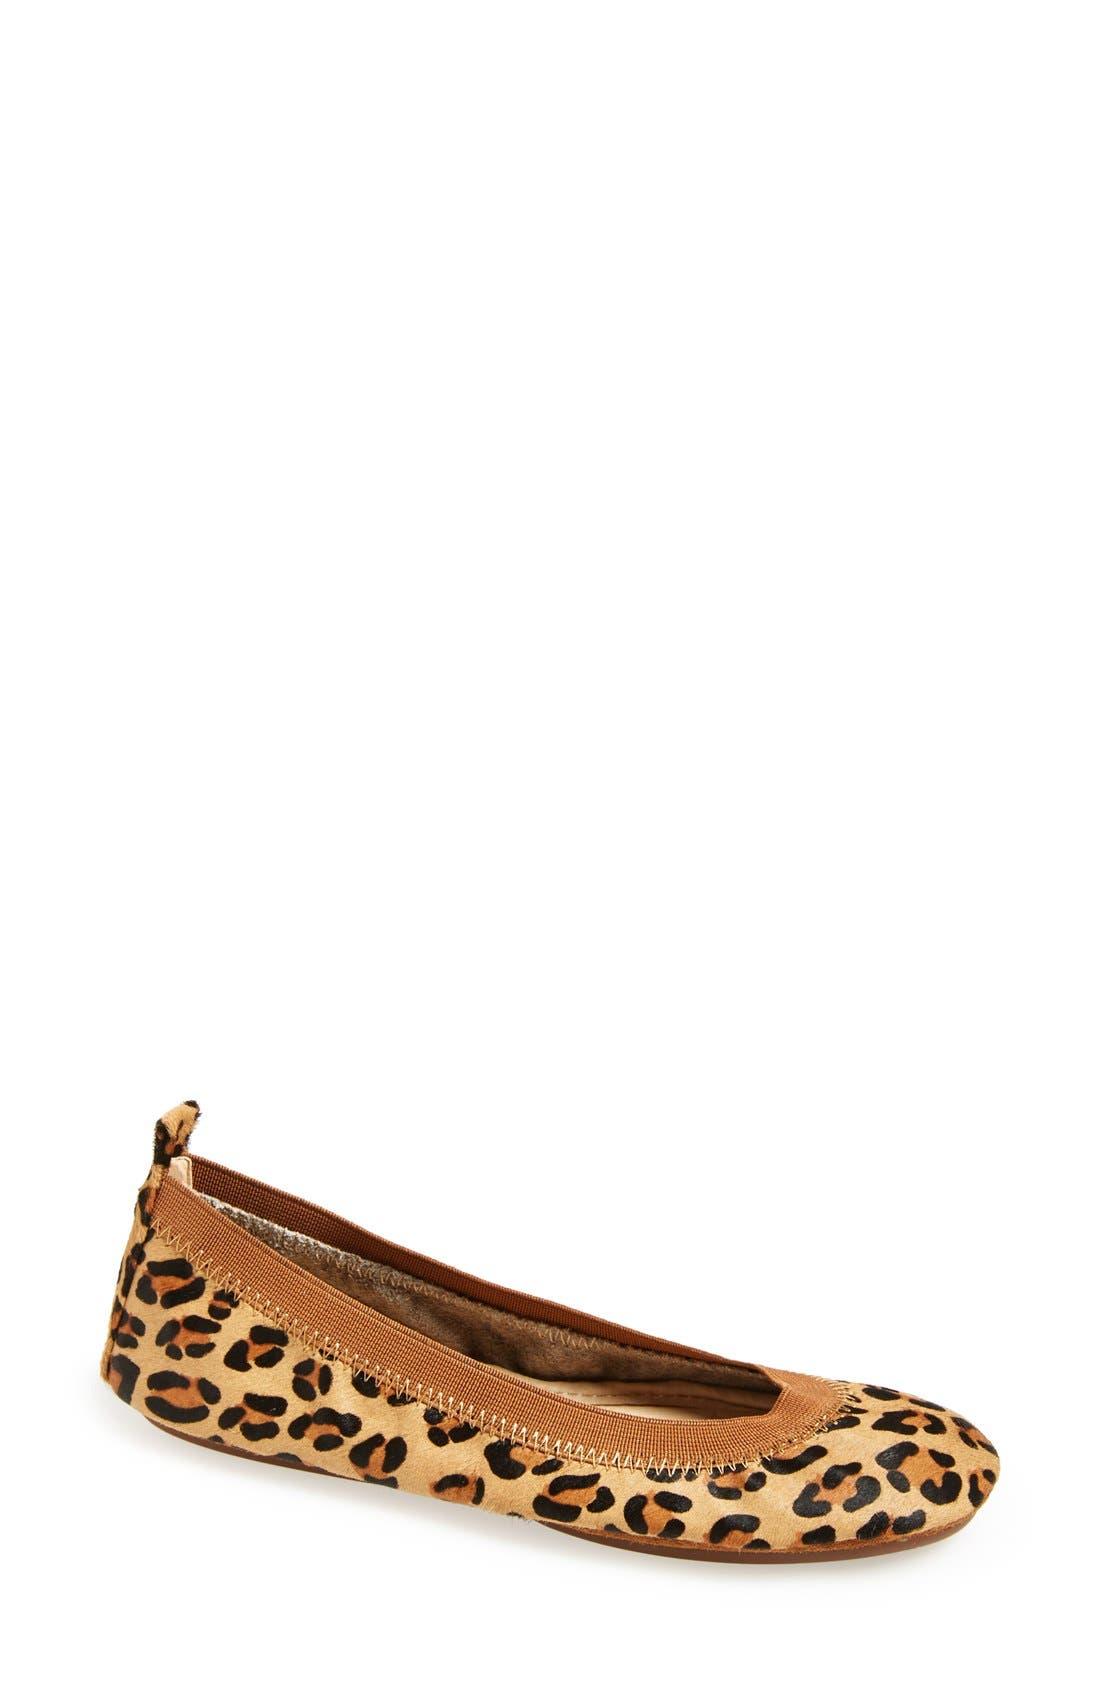 'Samara' Genuine Calf Hair Foldable Ballet Flat,                             Main thumbnail 1, color,                             Leopard